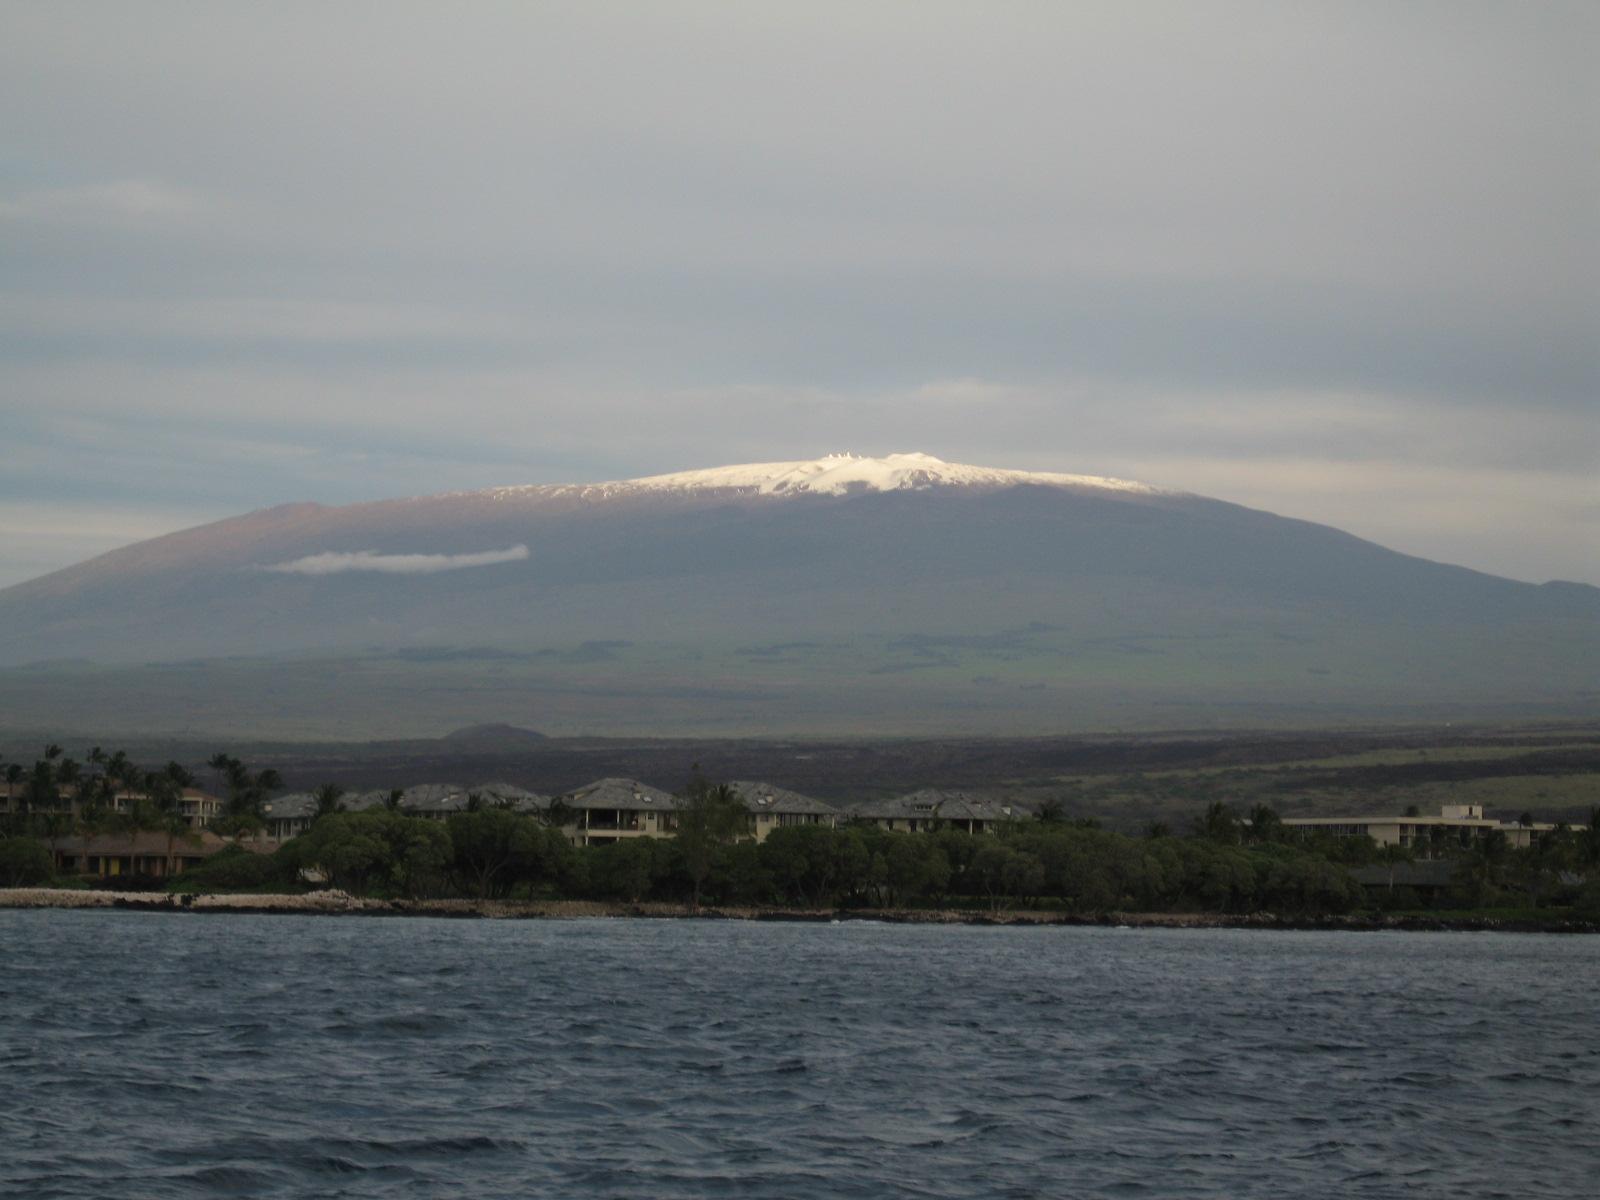 Mauna_Kea_from_the_ocean.jpg